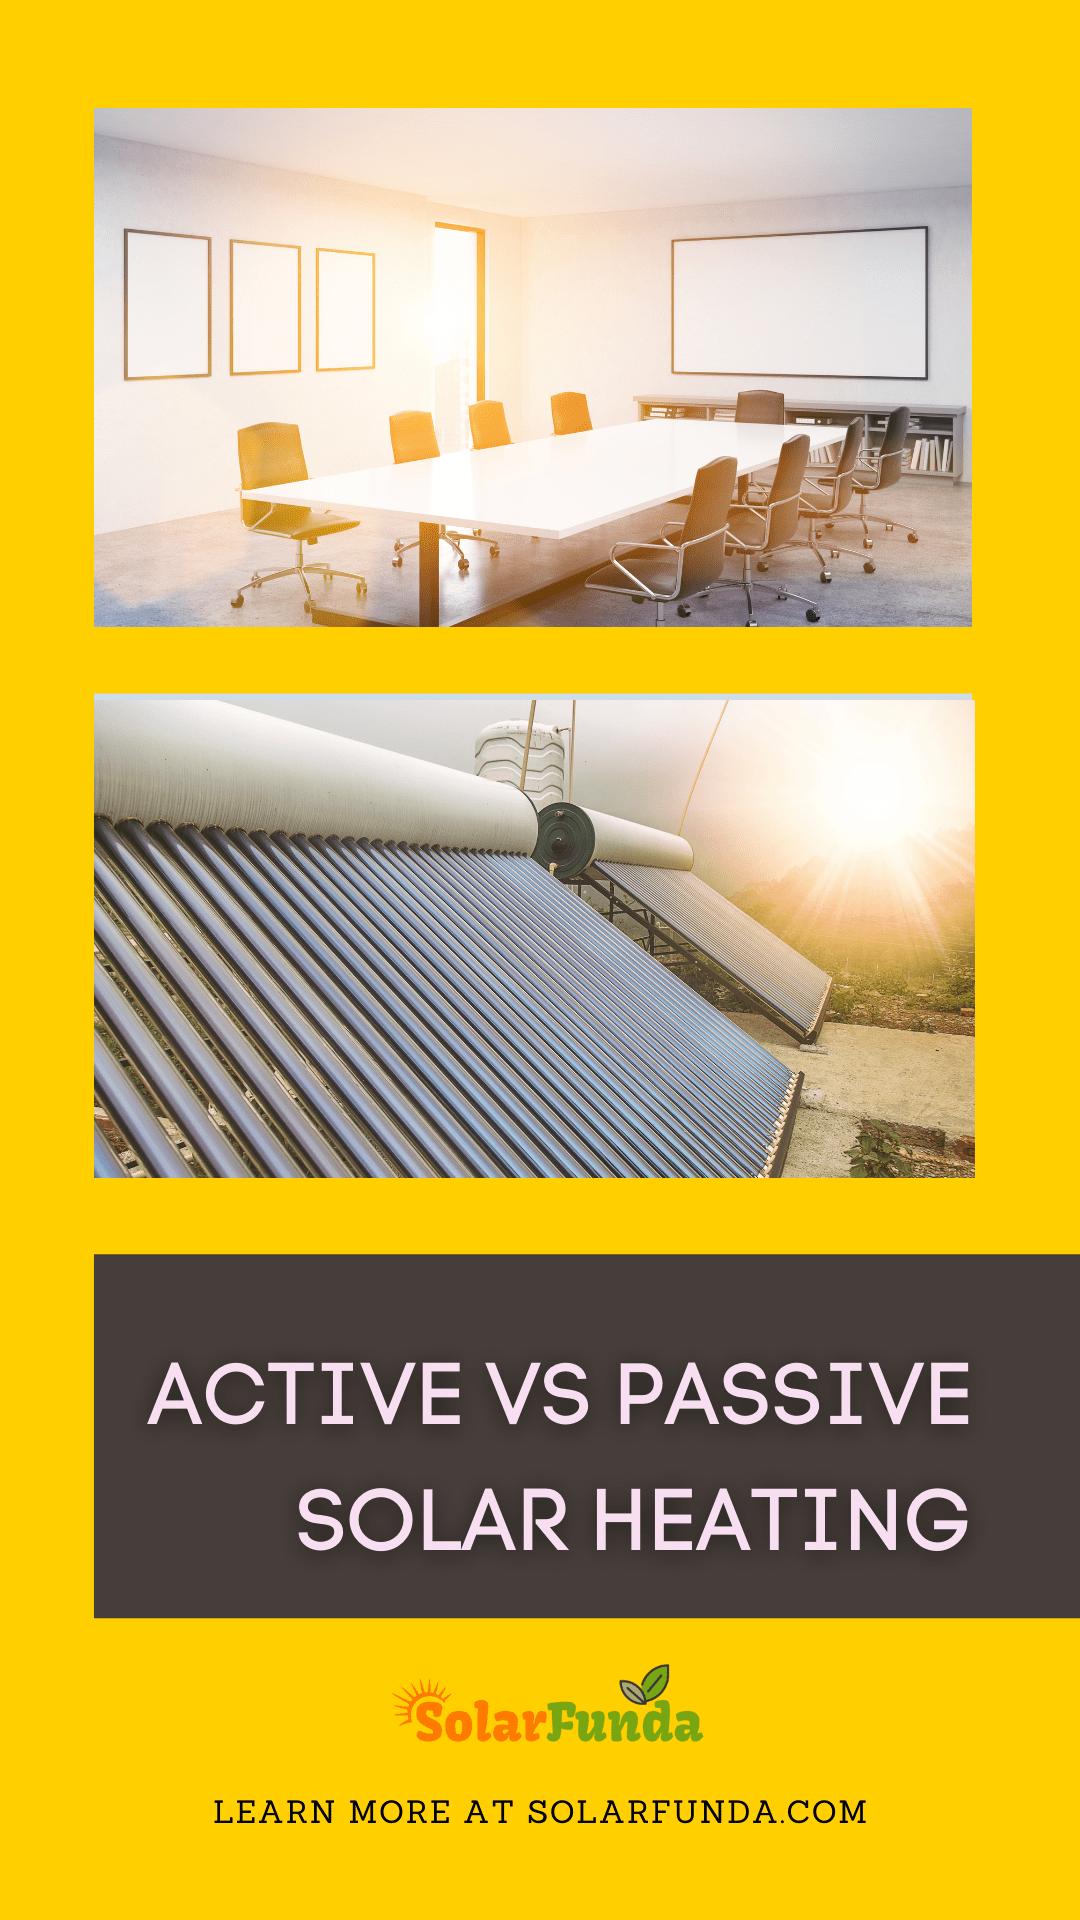 Active vs Passive Solar Heating